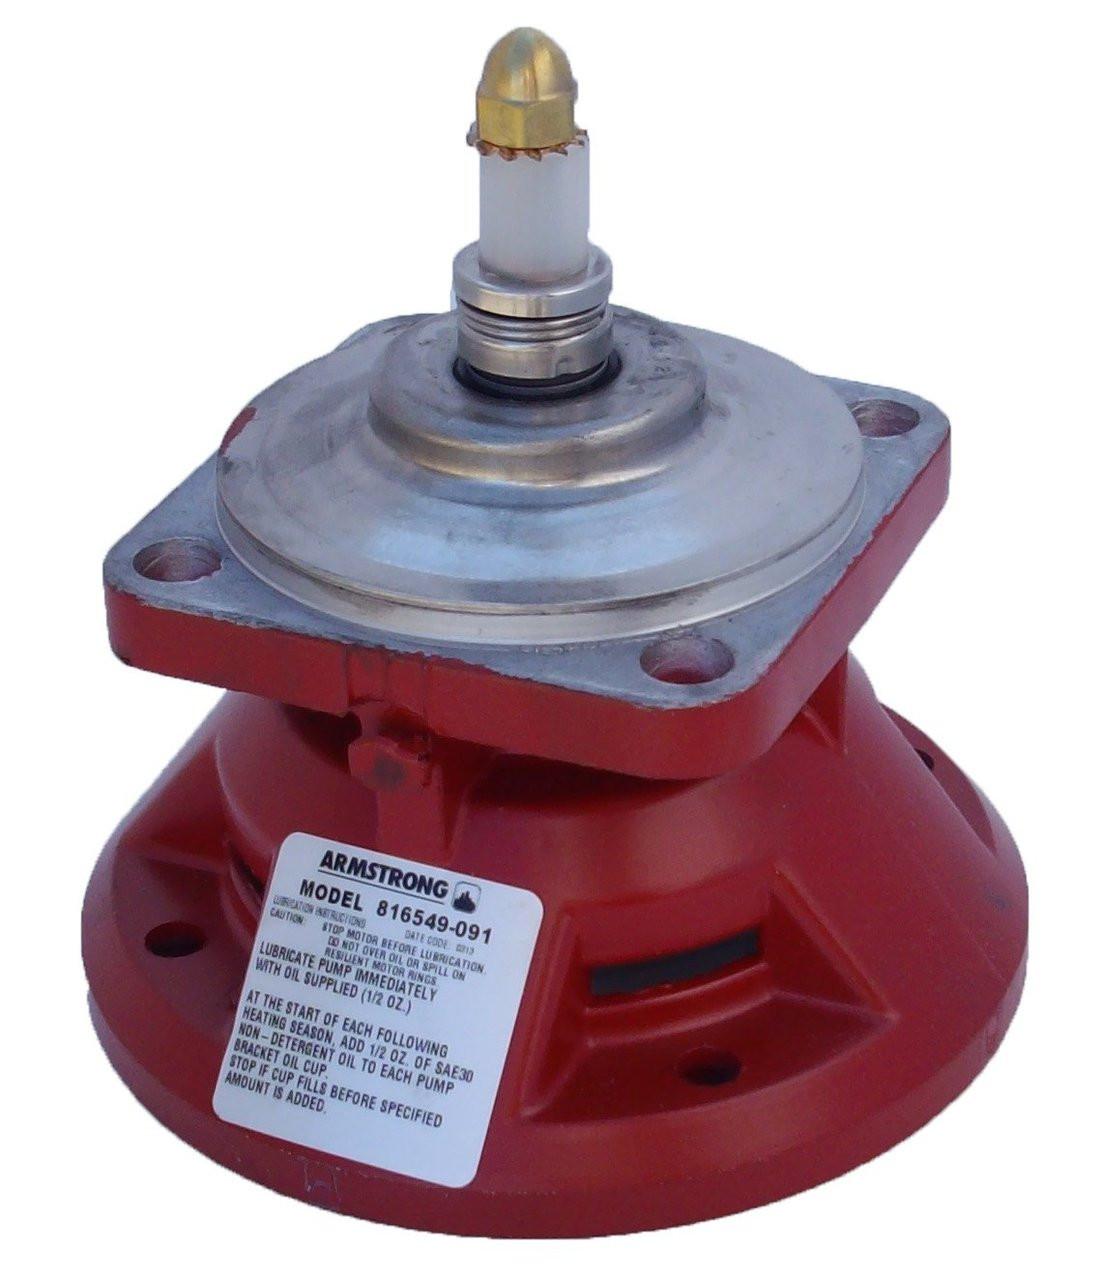 816549_091__16976.1435585366.1280.1280?c=2 armstrong circulation pump bearing assemblies electric motor,Armstrong Pump Motor Wiring Diagram